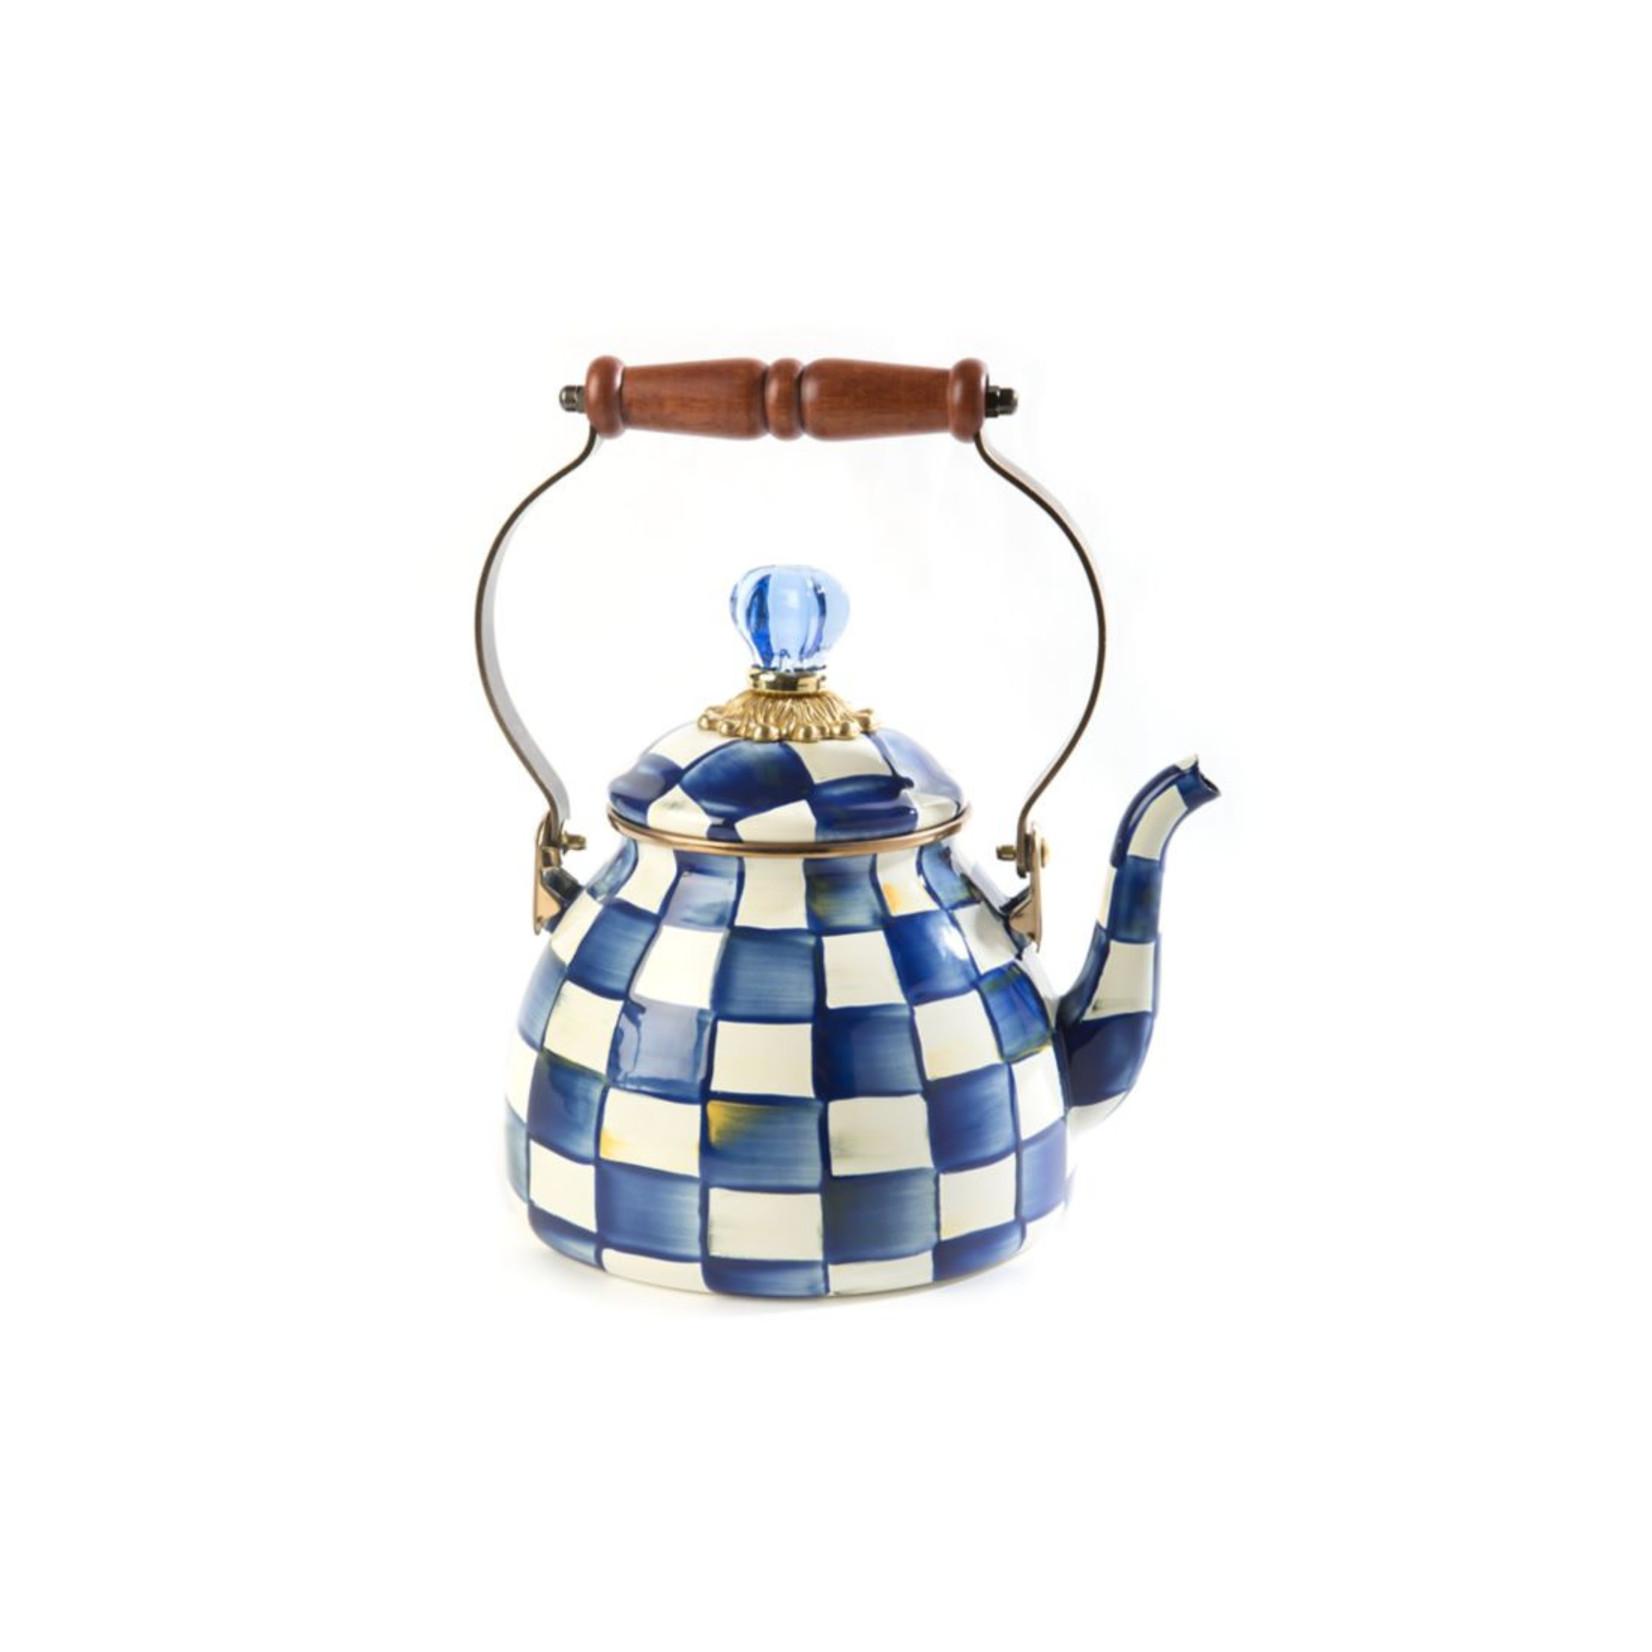 MacKenzie Childs Royal Check Tea Kettle - 2 Quart